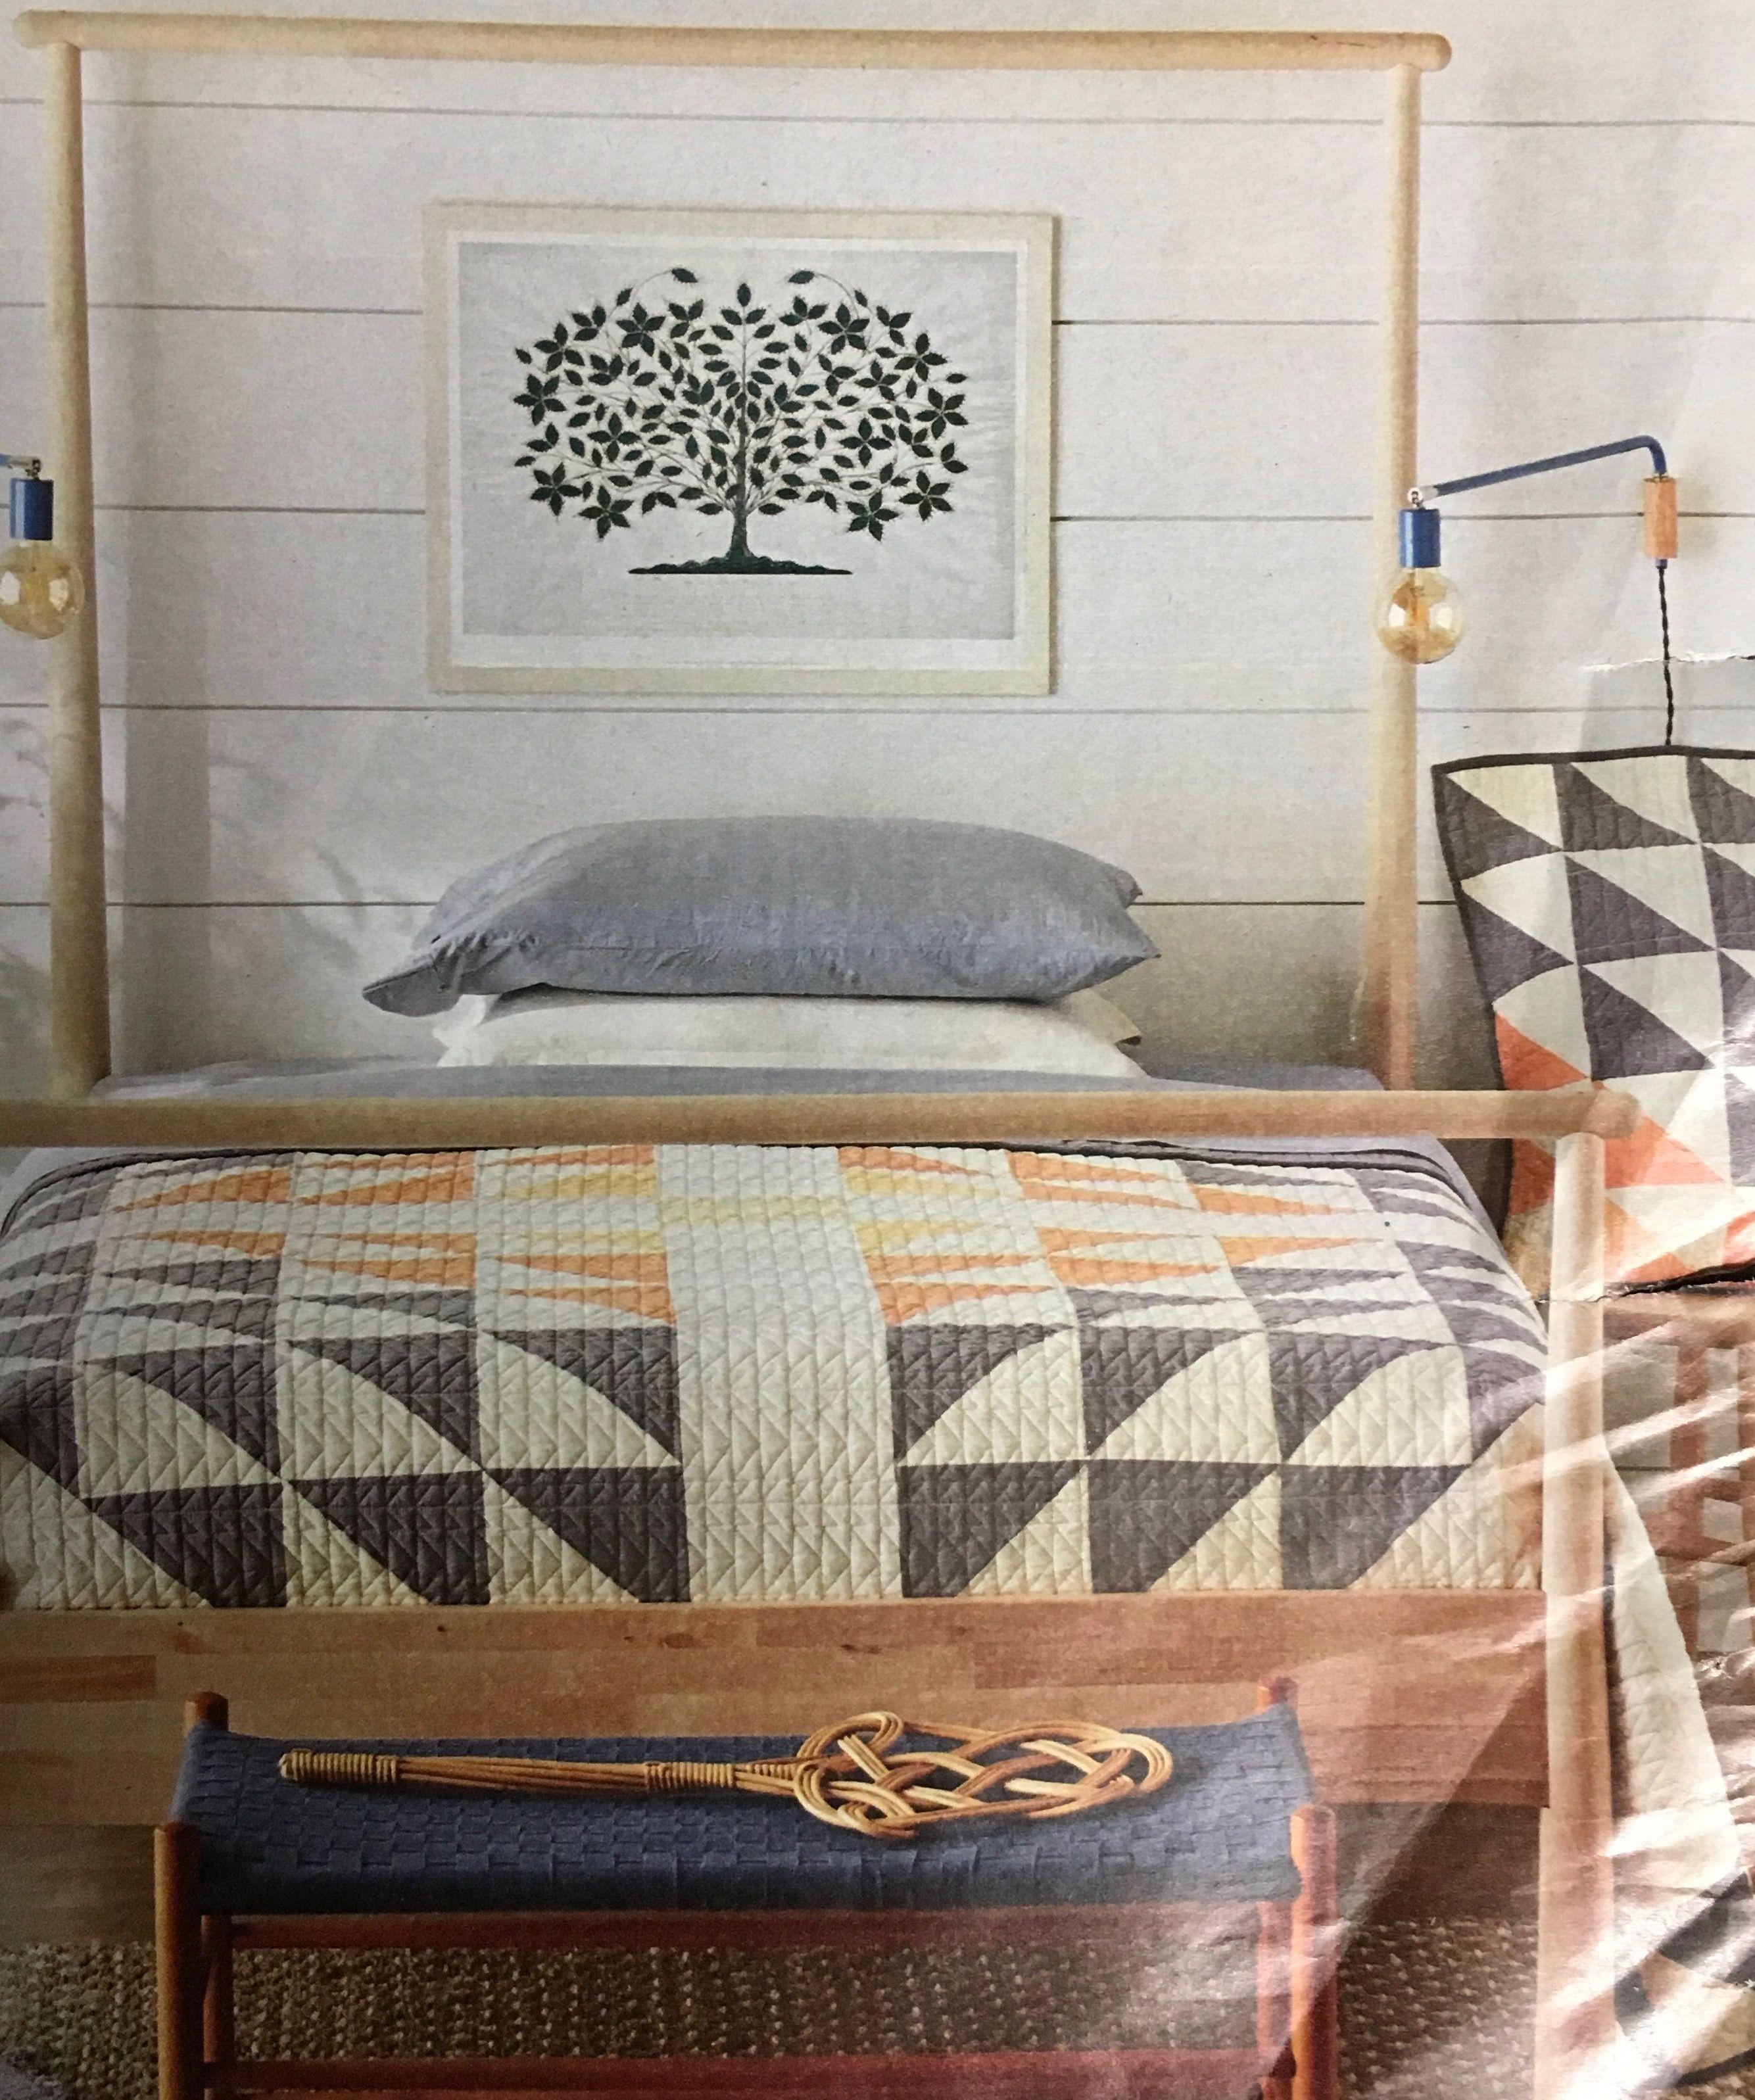 design com in bedding beddingwalmart dino mainstays boy stripe blue roam of boys bag set photos for kids room size imposing walmart full quilt quilts